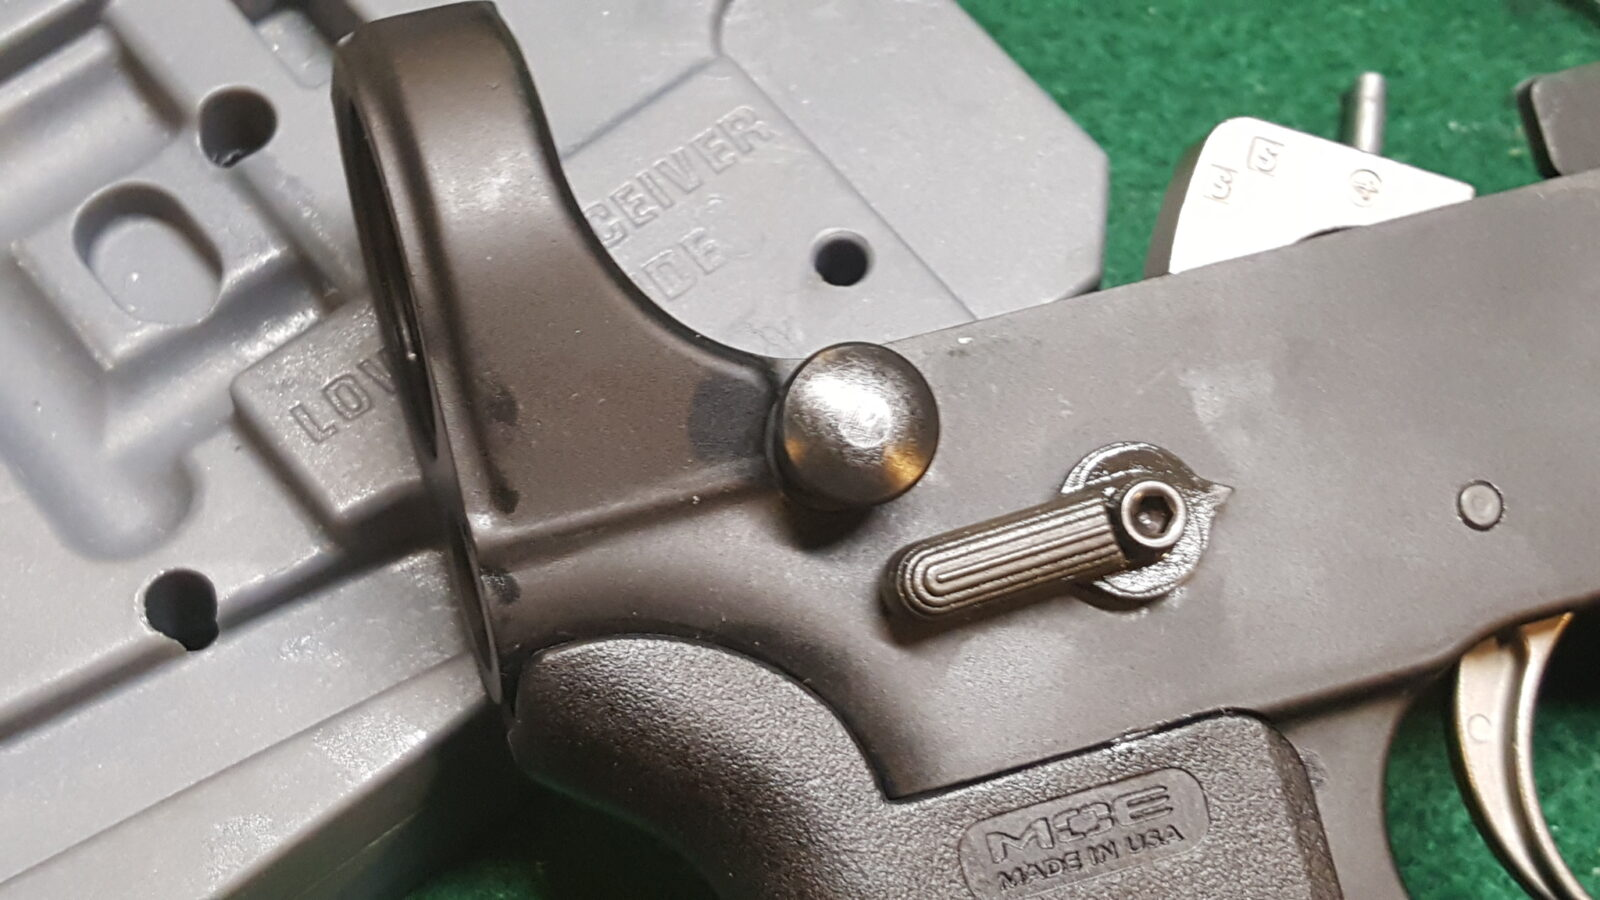 Assembling an AR Lower - Step 9 of 11: Installing the Buffer Tube